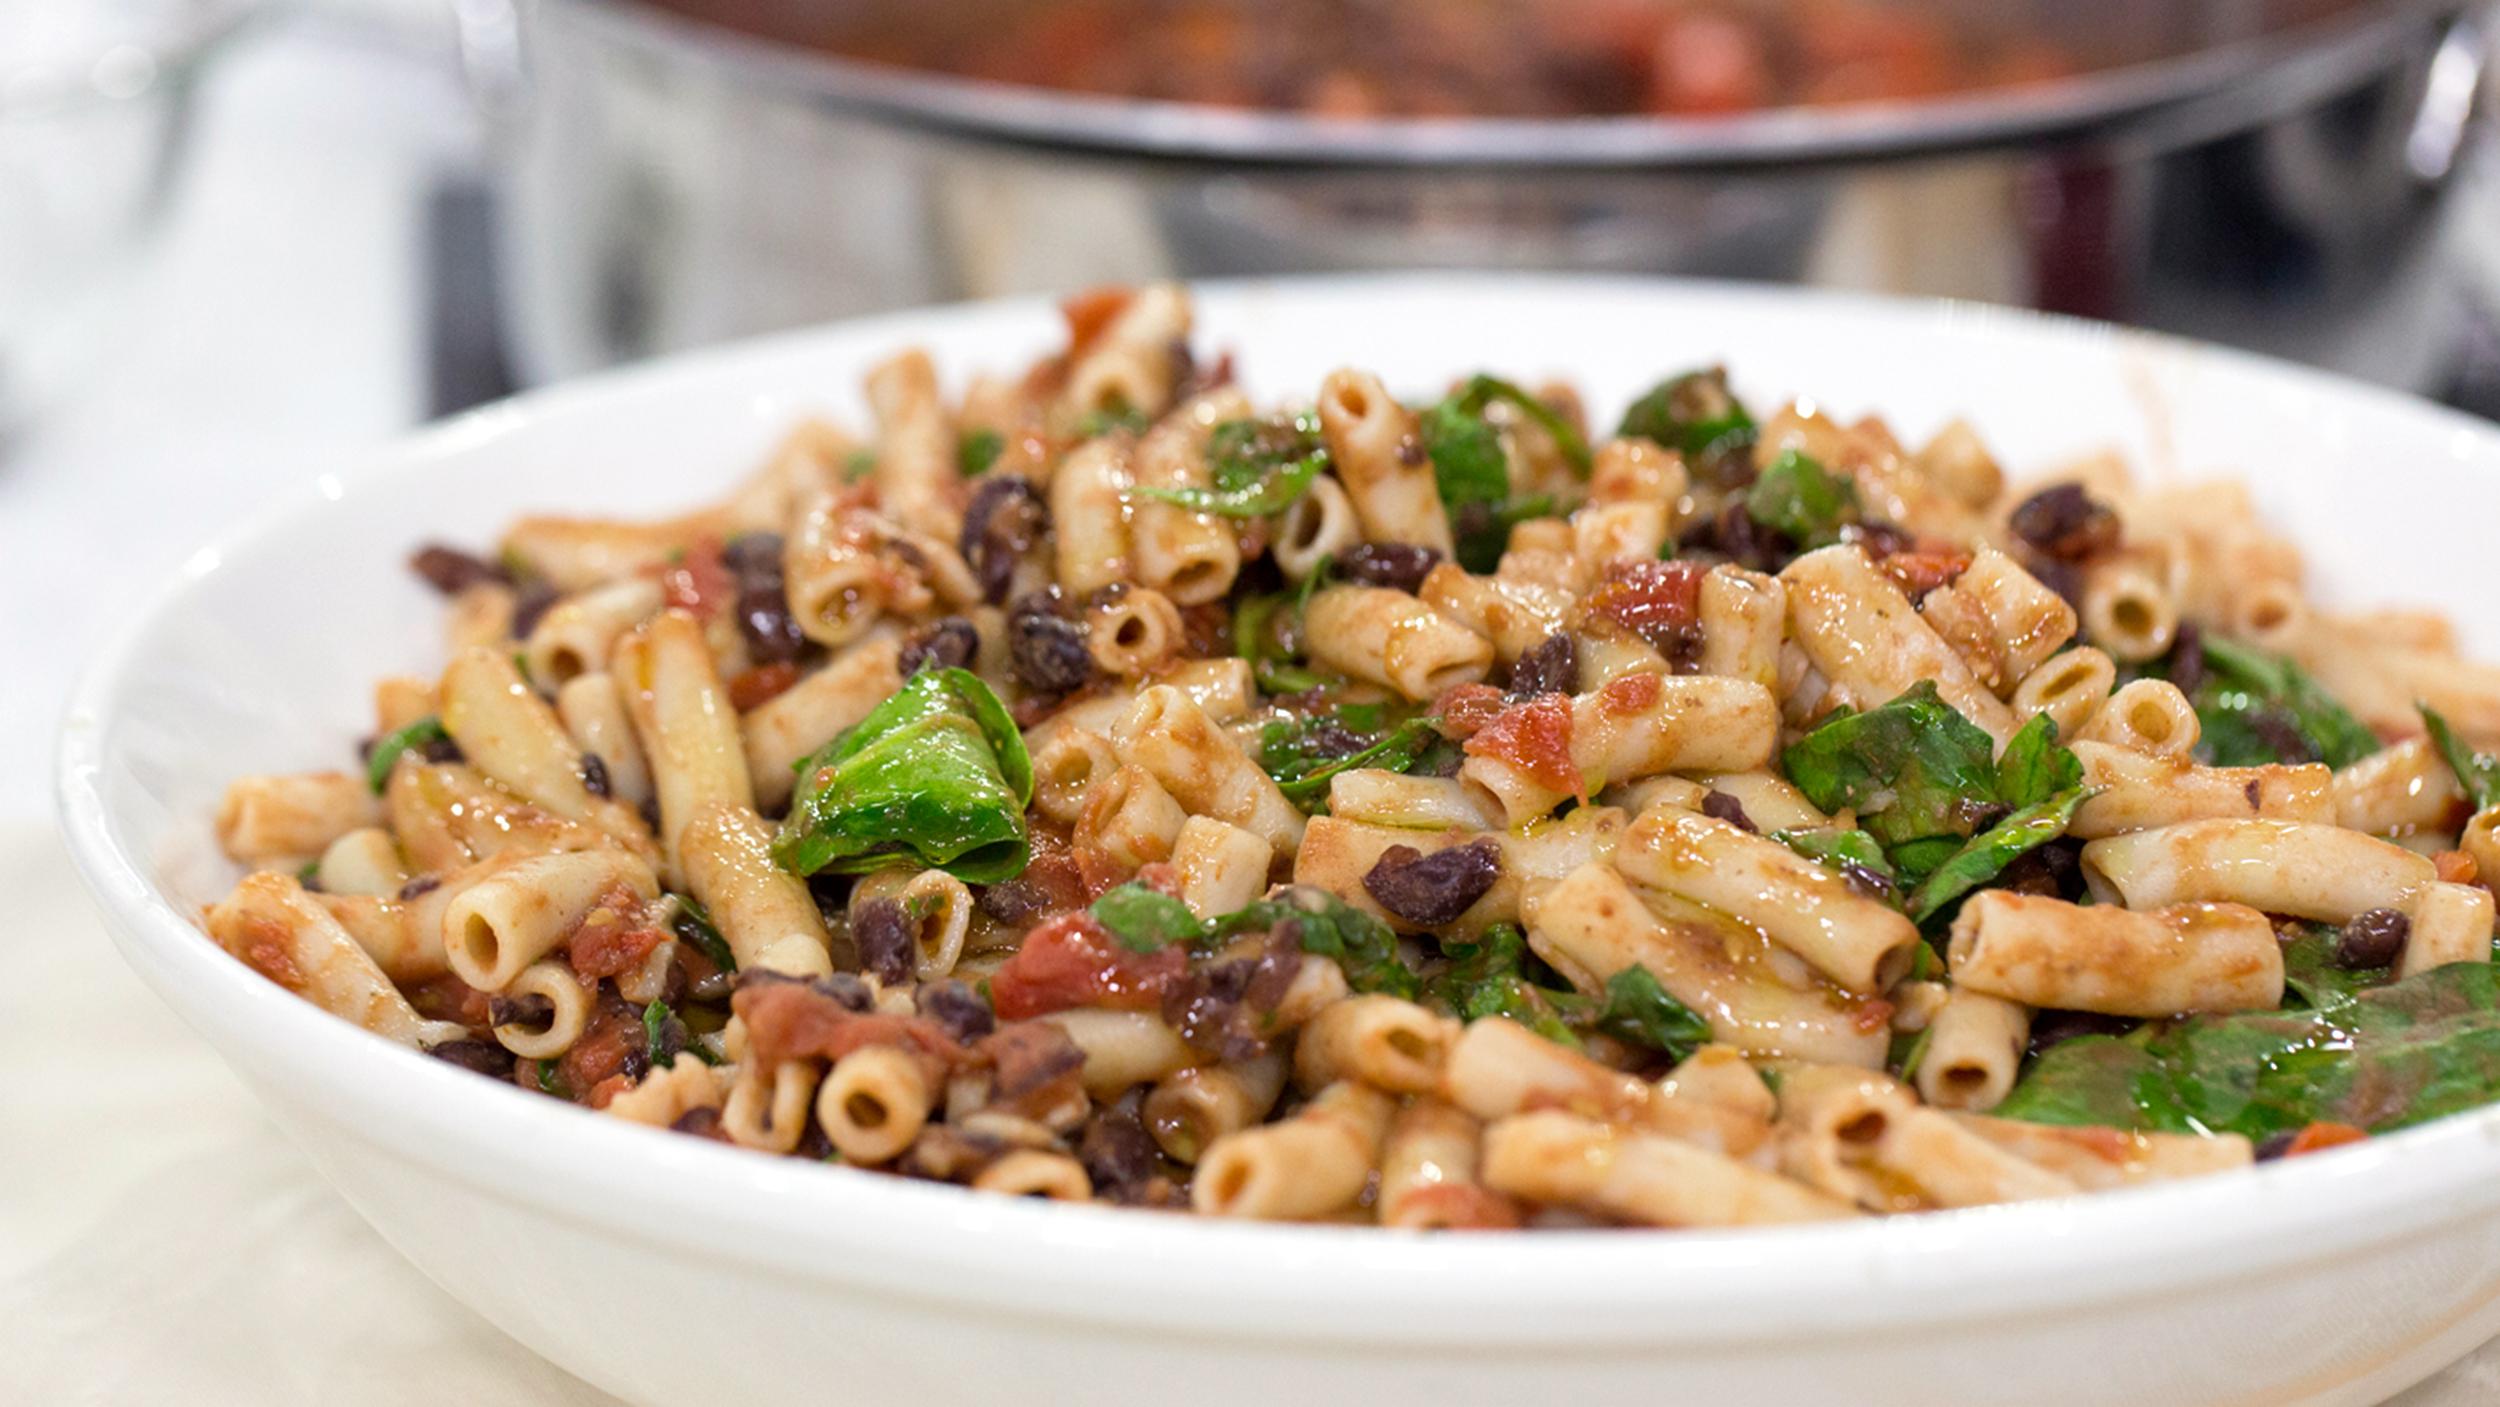 Ella woodward shares one pot recipes tomato pasta and bean chili ella woodward shares one pot recipes tomato pasta and bean chili today forumfinder Gallery